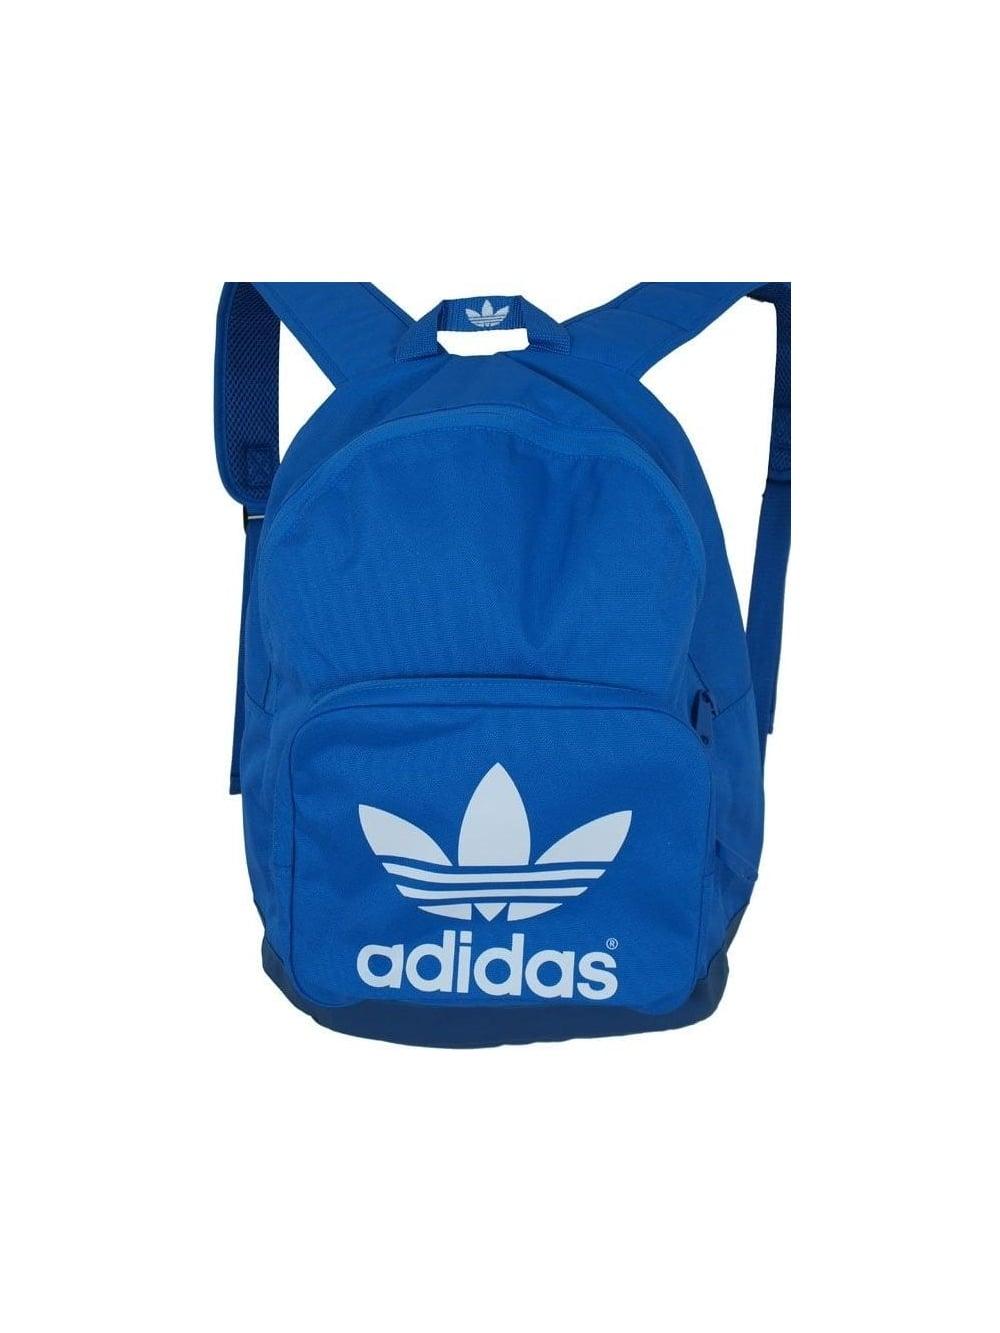 Adidas Originals AC Classic Canvas Backpack in Bluebird - Northern ... 62ec8448eb